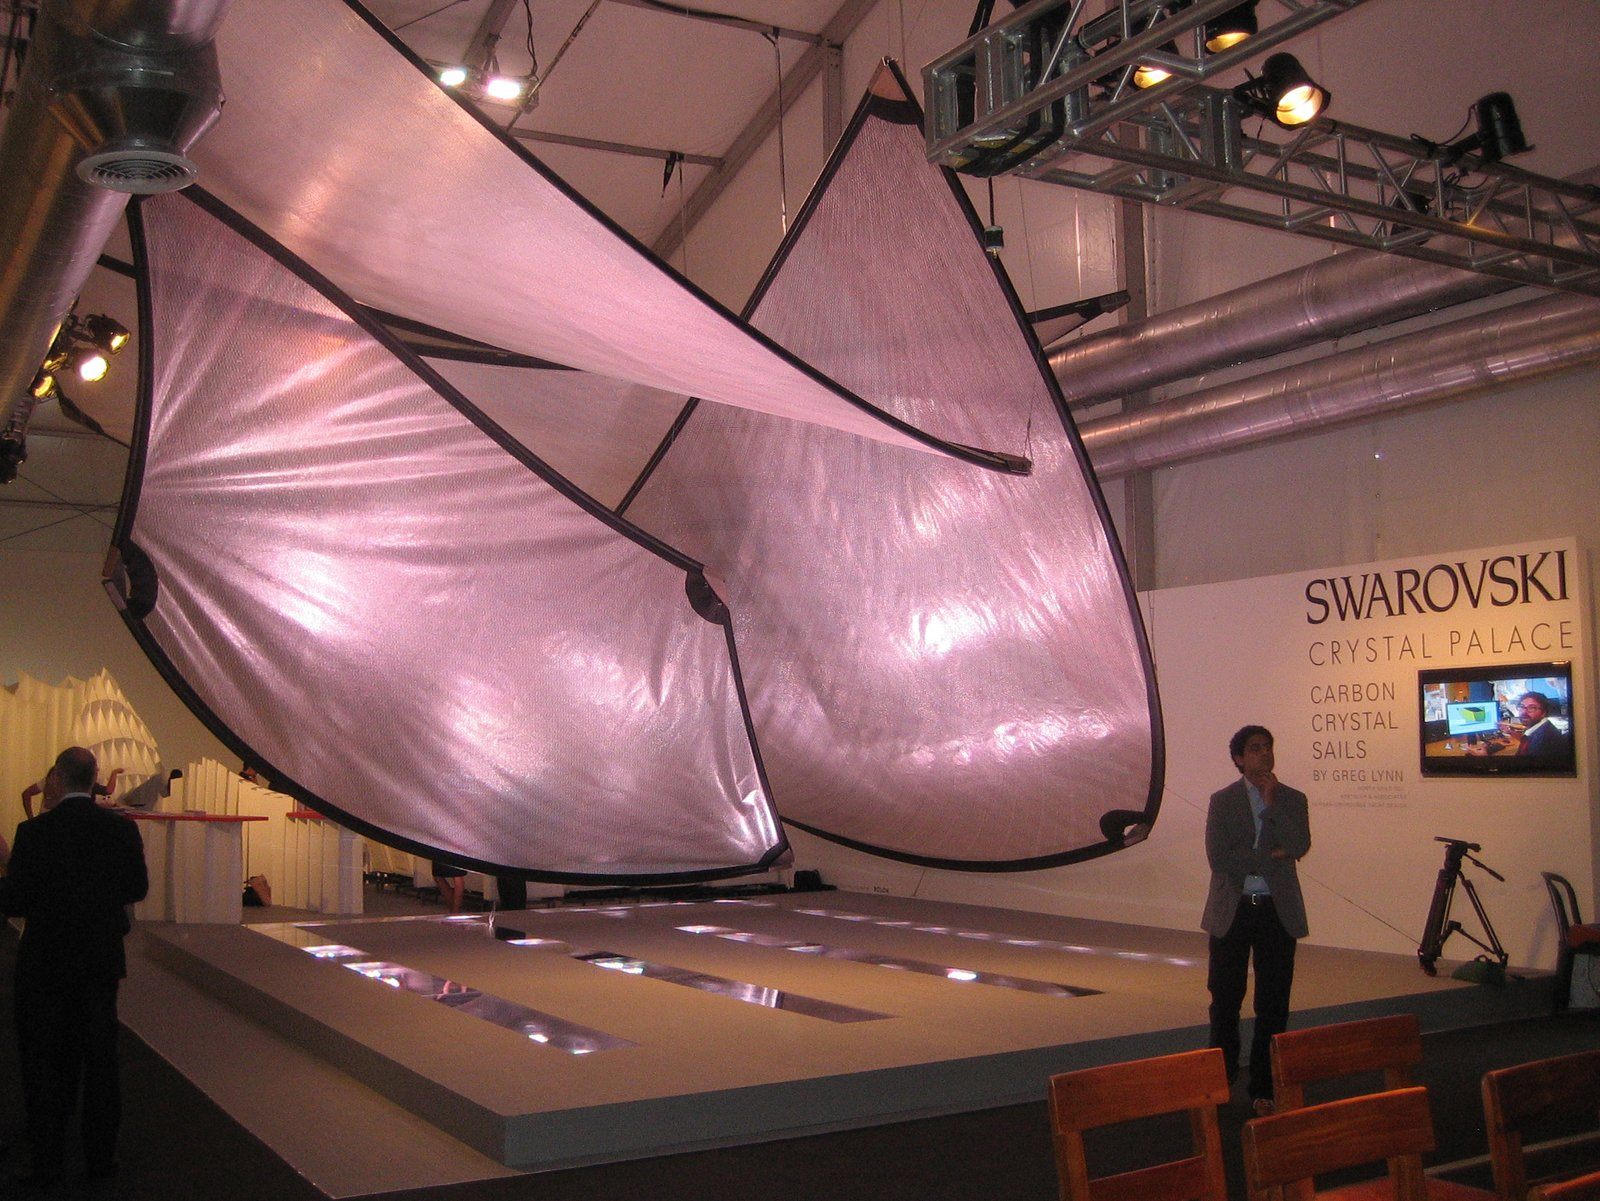 "Greg Lynn designed a massive, color-changing installation for Swarovski that sat between the VIP lounge and the bathrooms.  Search ""동해출장마사지-출장안마-출장-출장서비스 동해콜걸 출장샵 주소ㅋr톡BC388 주소[sannhu222,vip] 동해 출장여대생 만남 출장만남 업소 타이마사지 출장샵추천 업소  동해출장샵 출장서비스 출장업소"" from Design Miami: Recap"